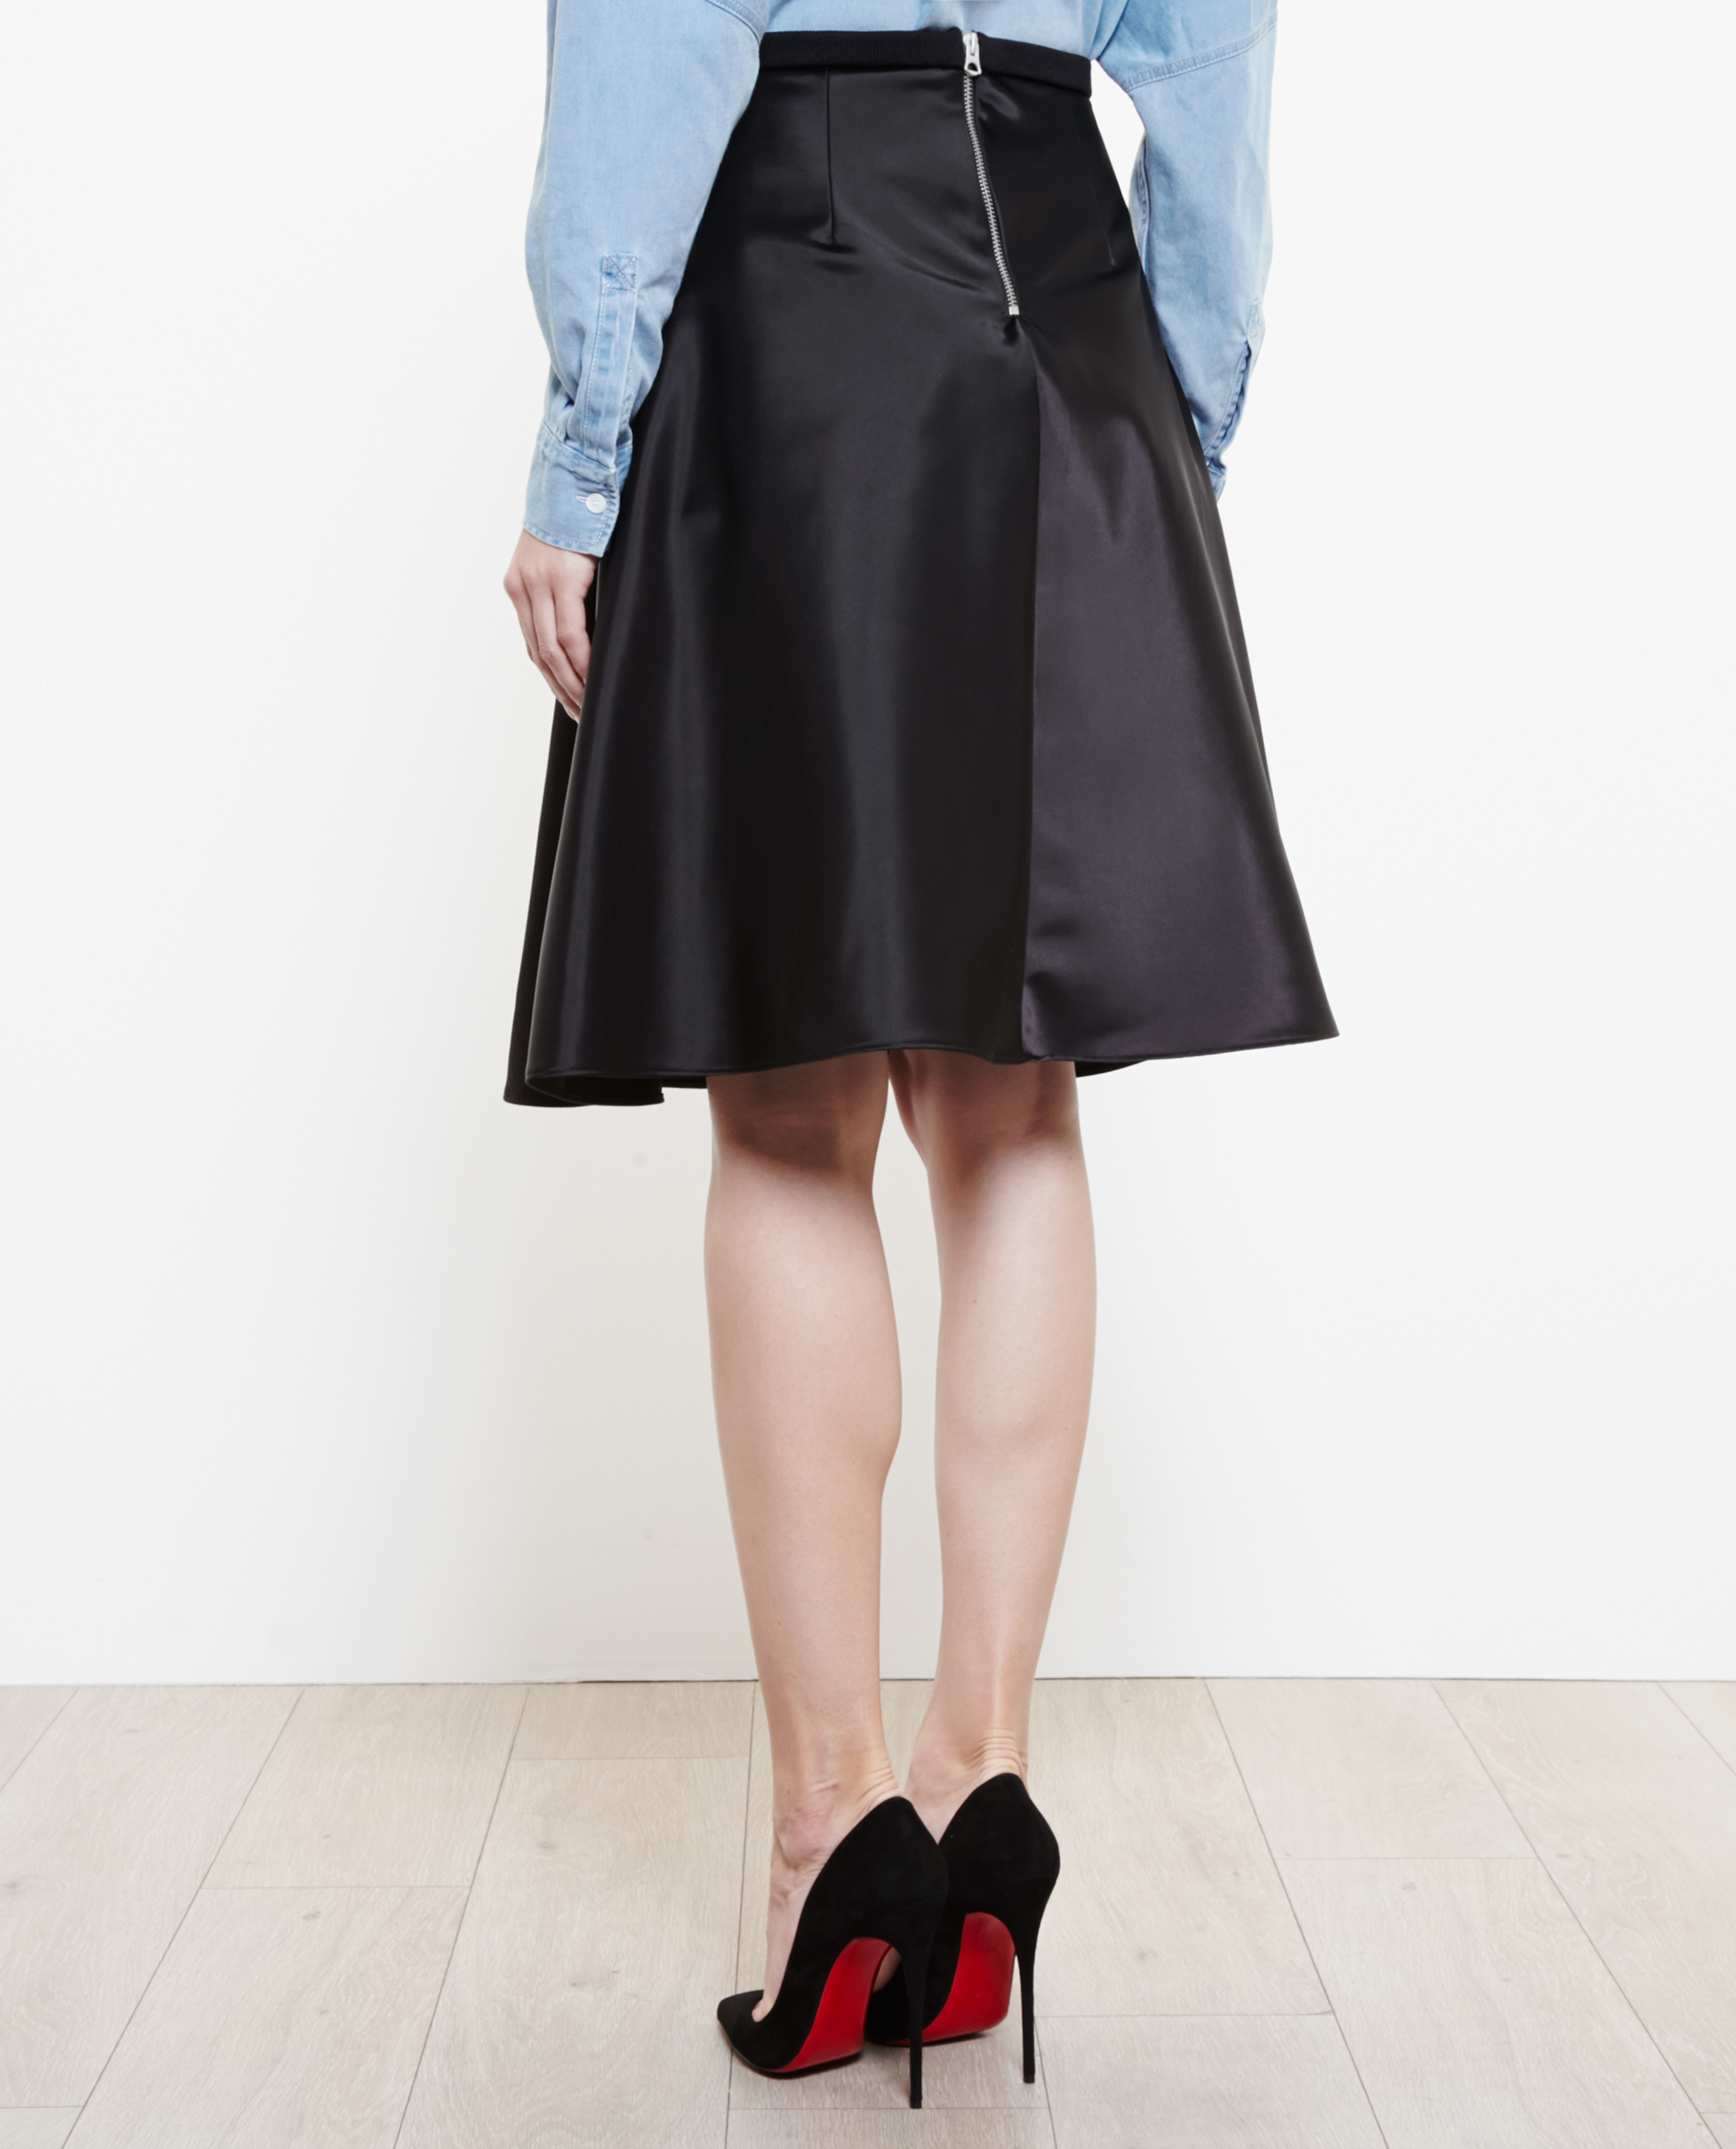 Acne Keals Satin Midi Skirt in Black | Lyst